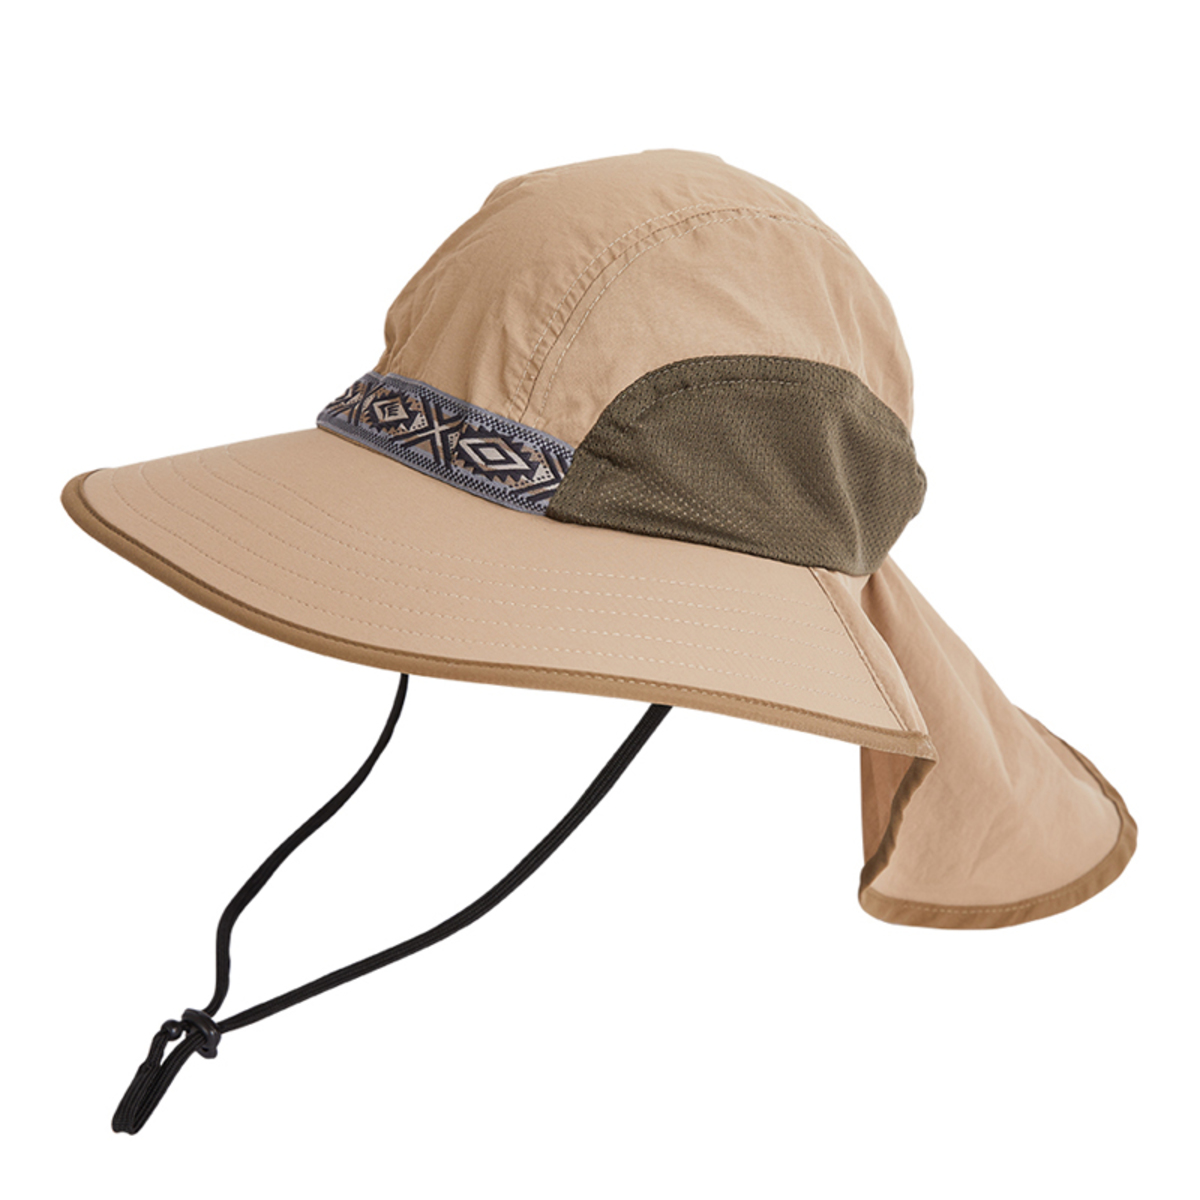 民族風闊邊防曬帽 - Escape Hat